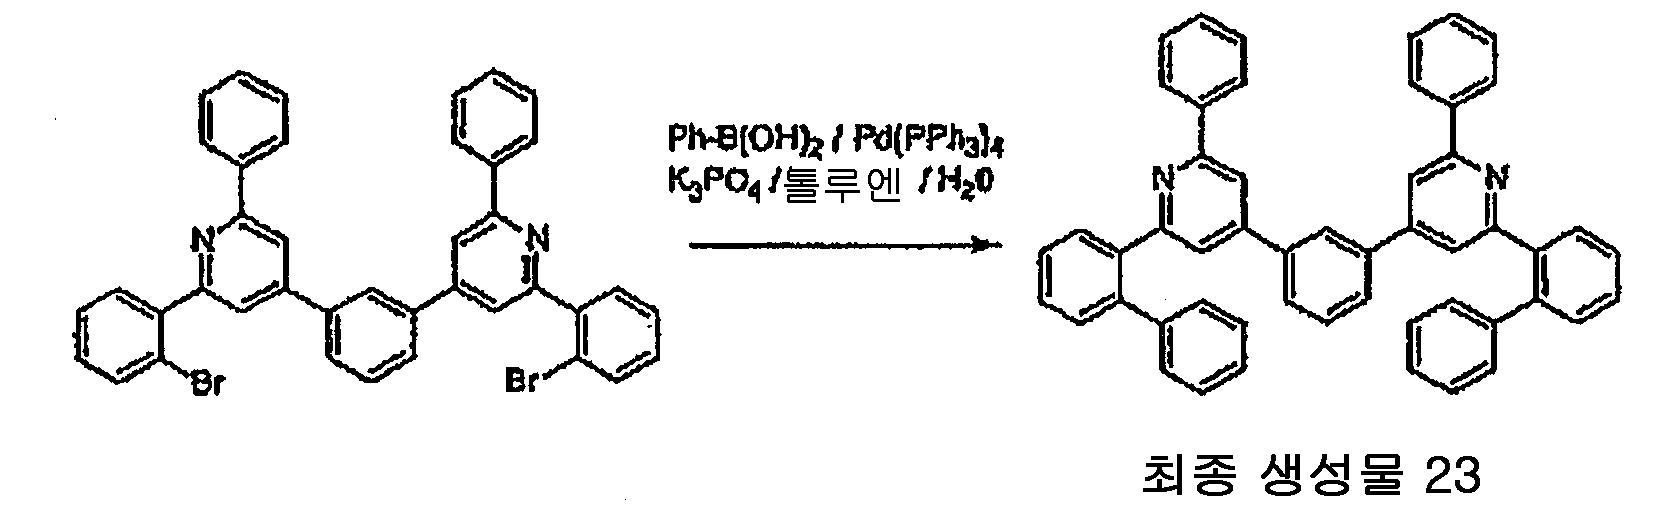 Figure 112010002231902-pat00118